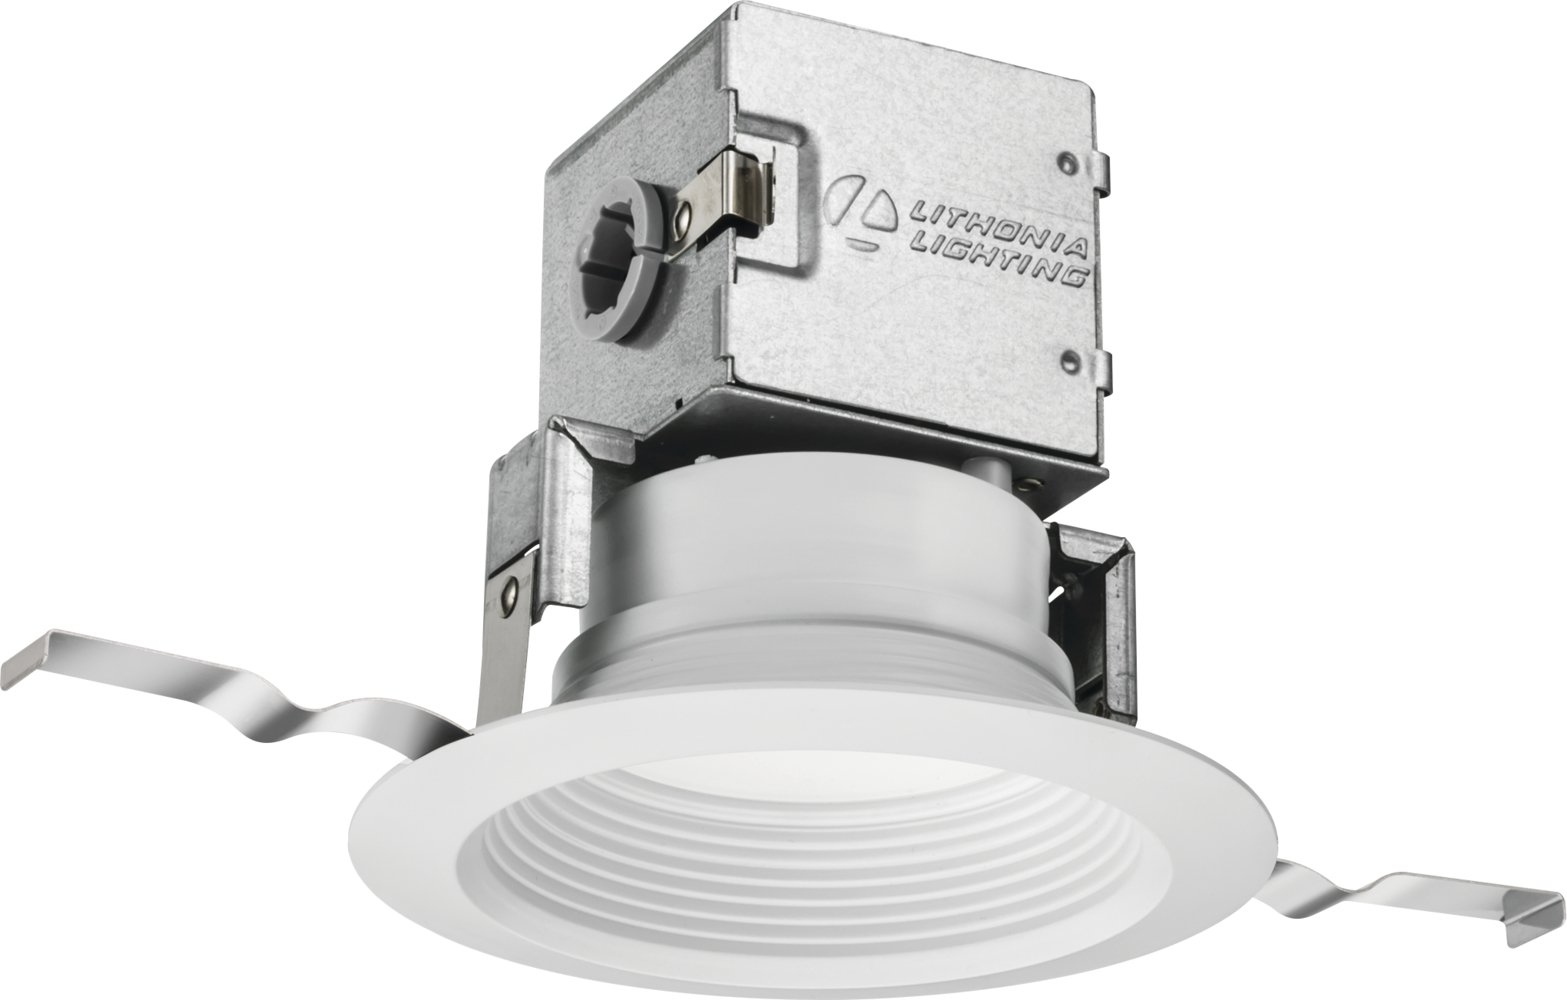 Lithonia Lighting 4JBK RD 30K 90CRI MW M6 3000K 90 CRI 4'' Baffle Canless Kit, 4-inch, Matte White